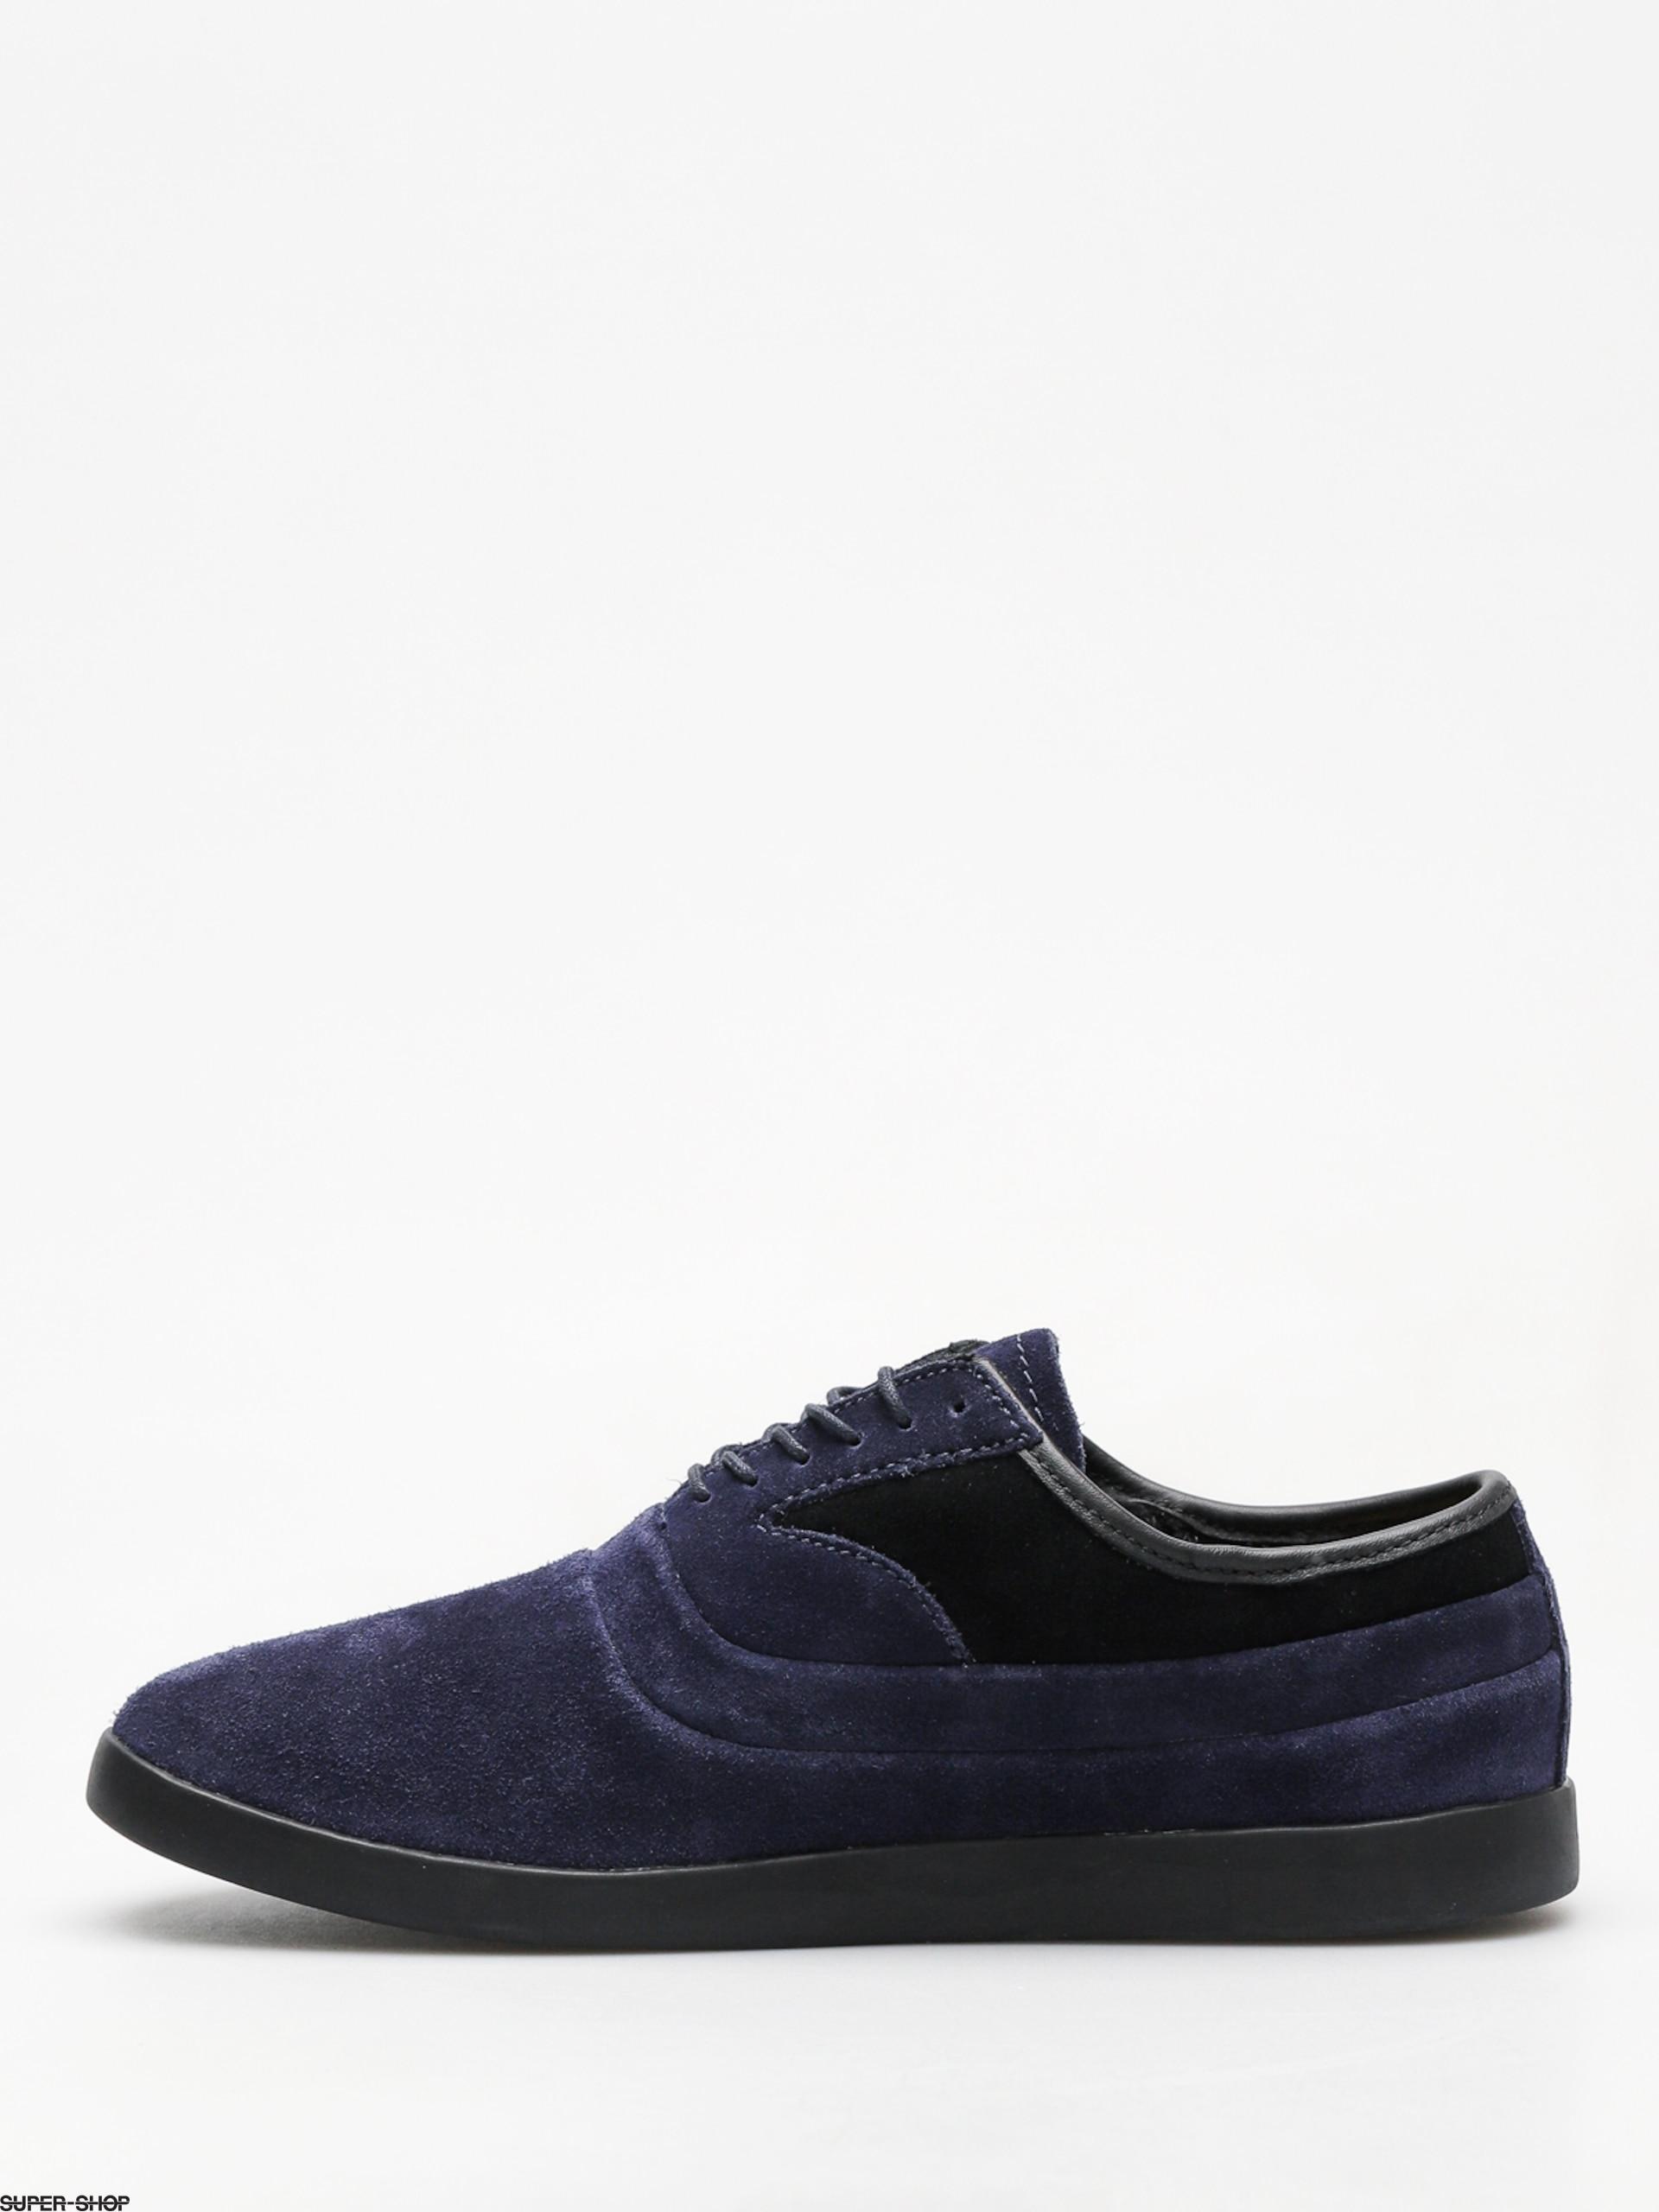 2692f76c7900 Supra Shoes Greco (blue suede)